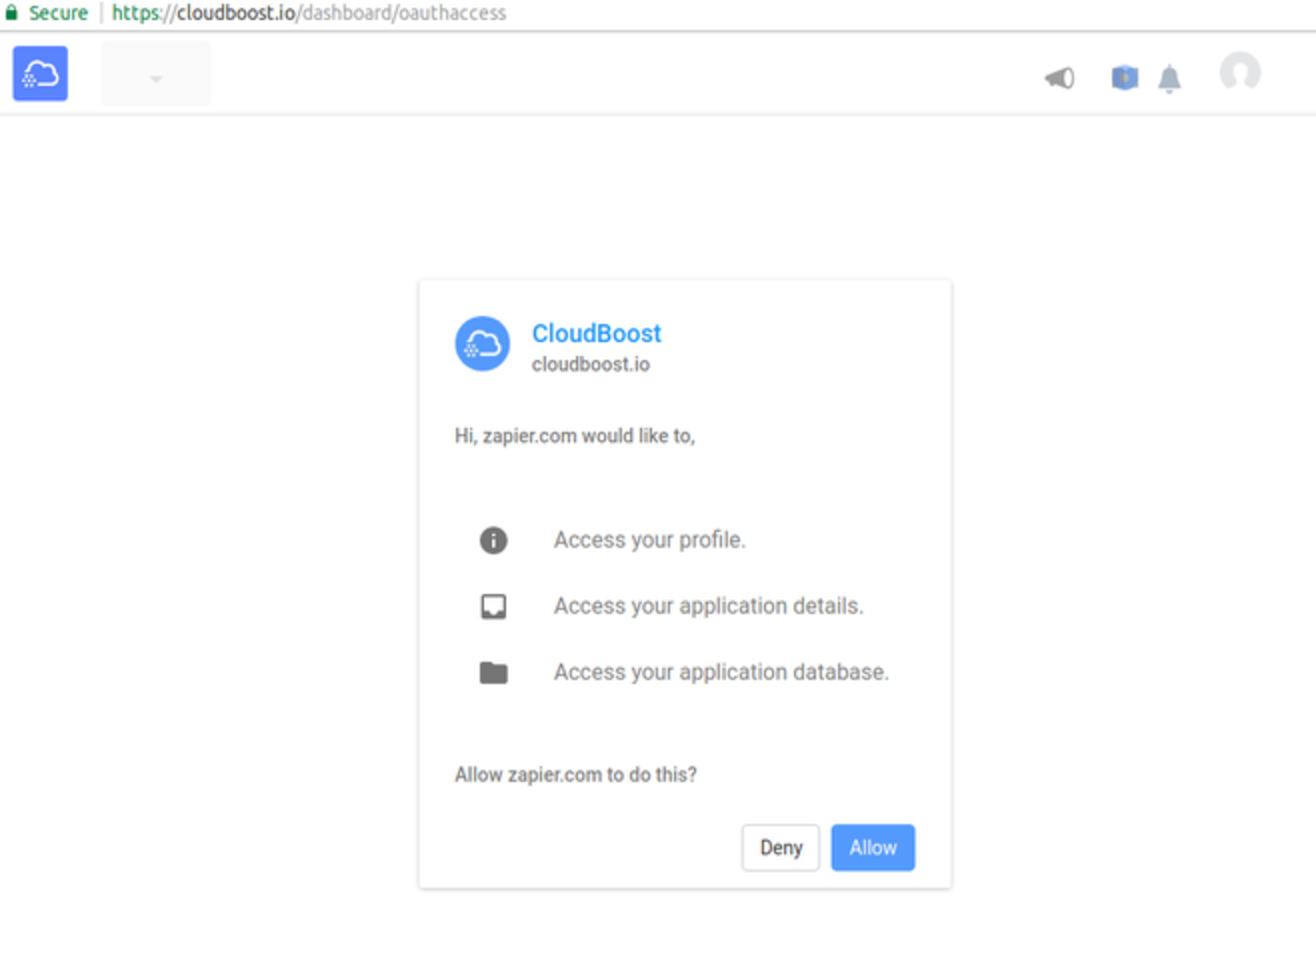 Authorize CloudBoost on Zapier